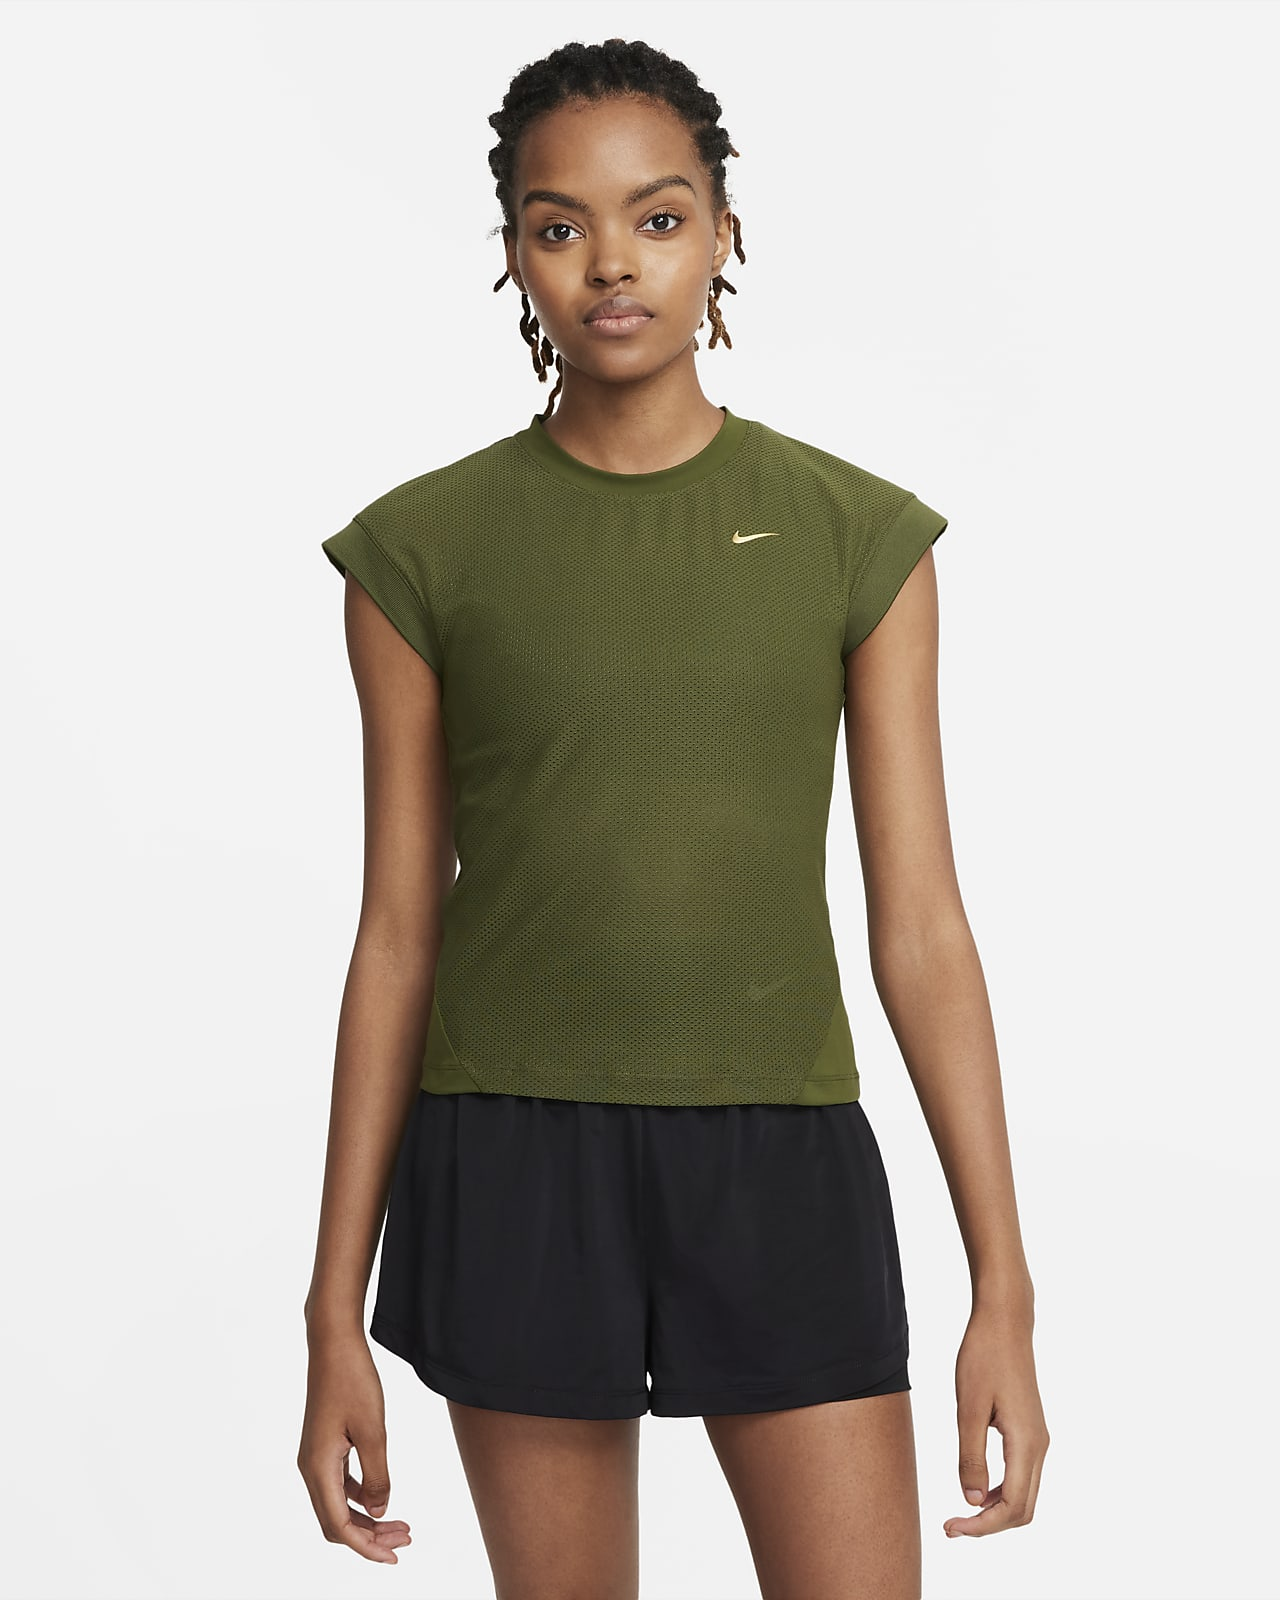 Serena Design Crew 女款短袖網球上衣